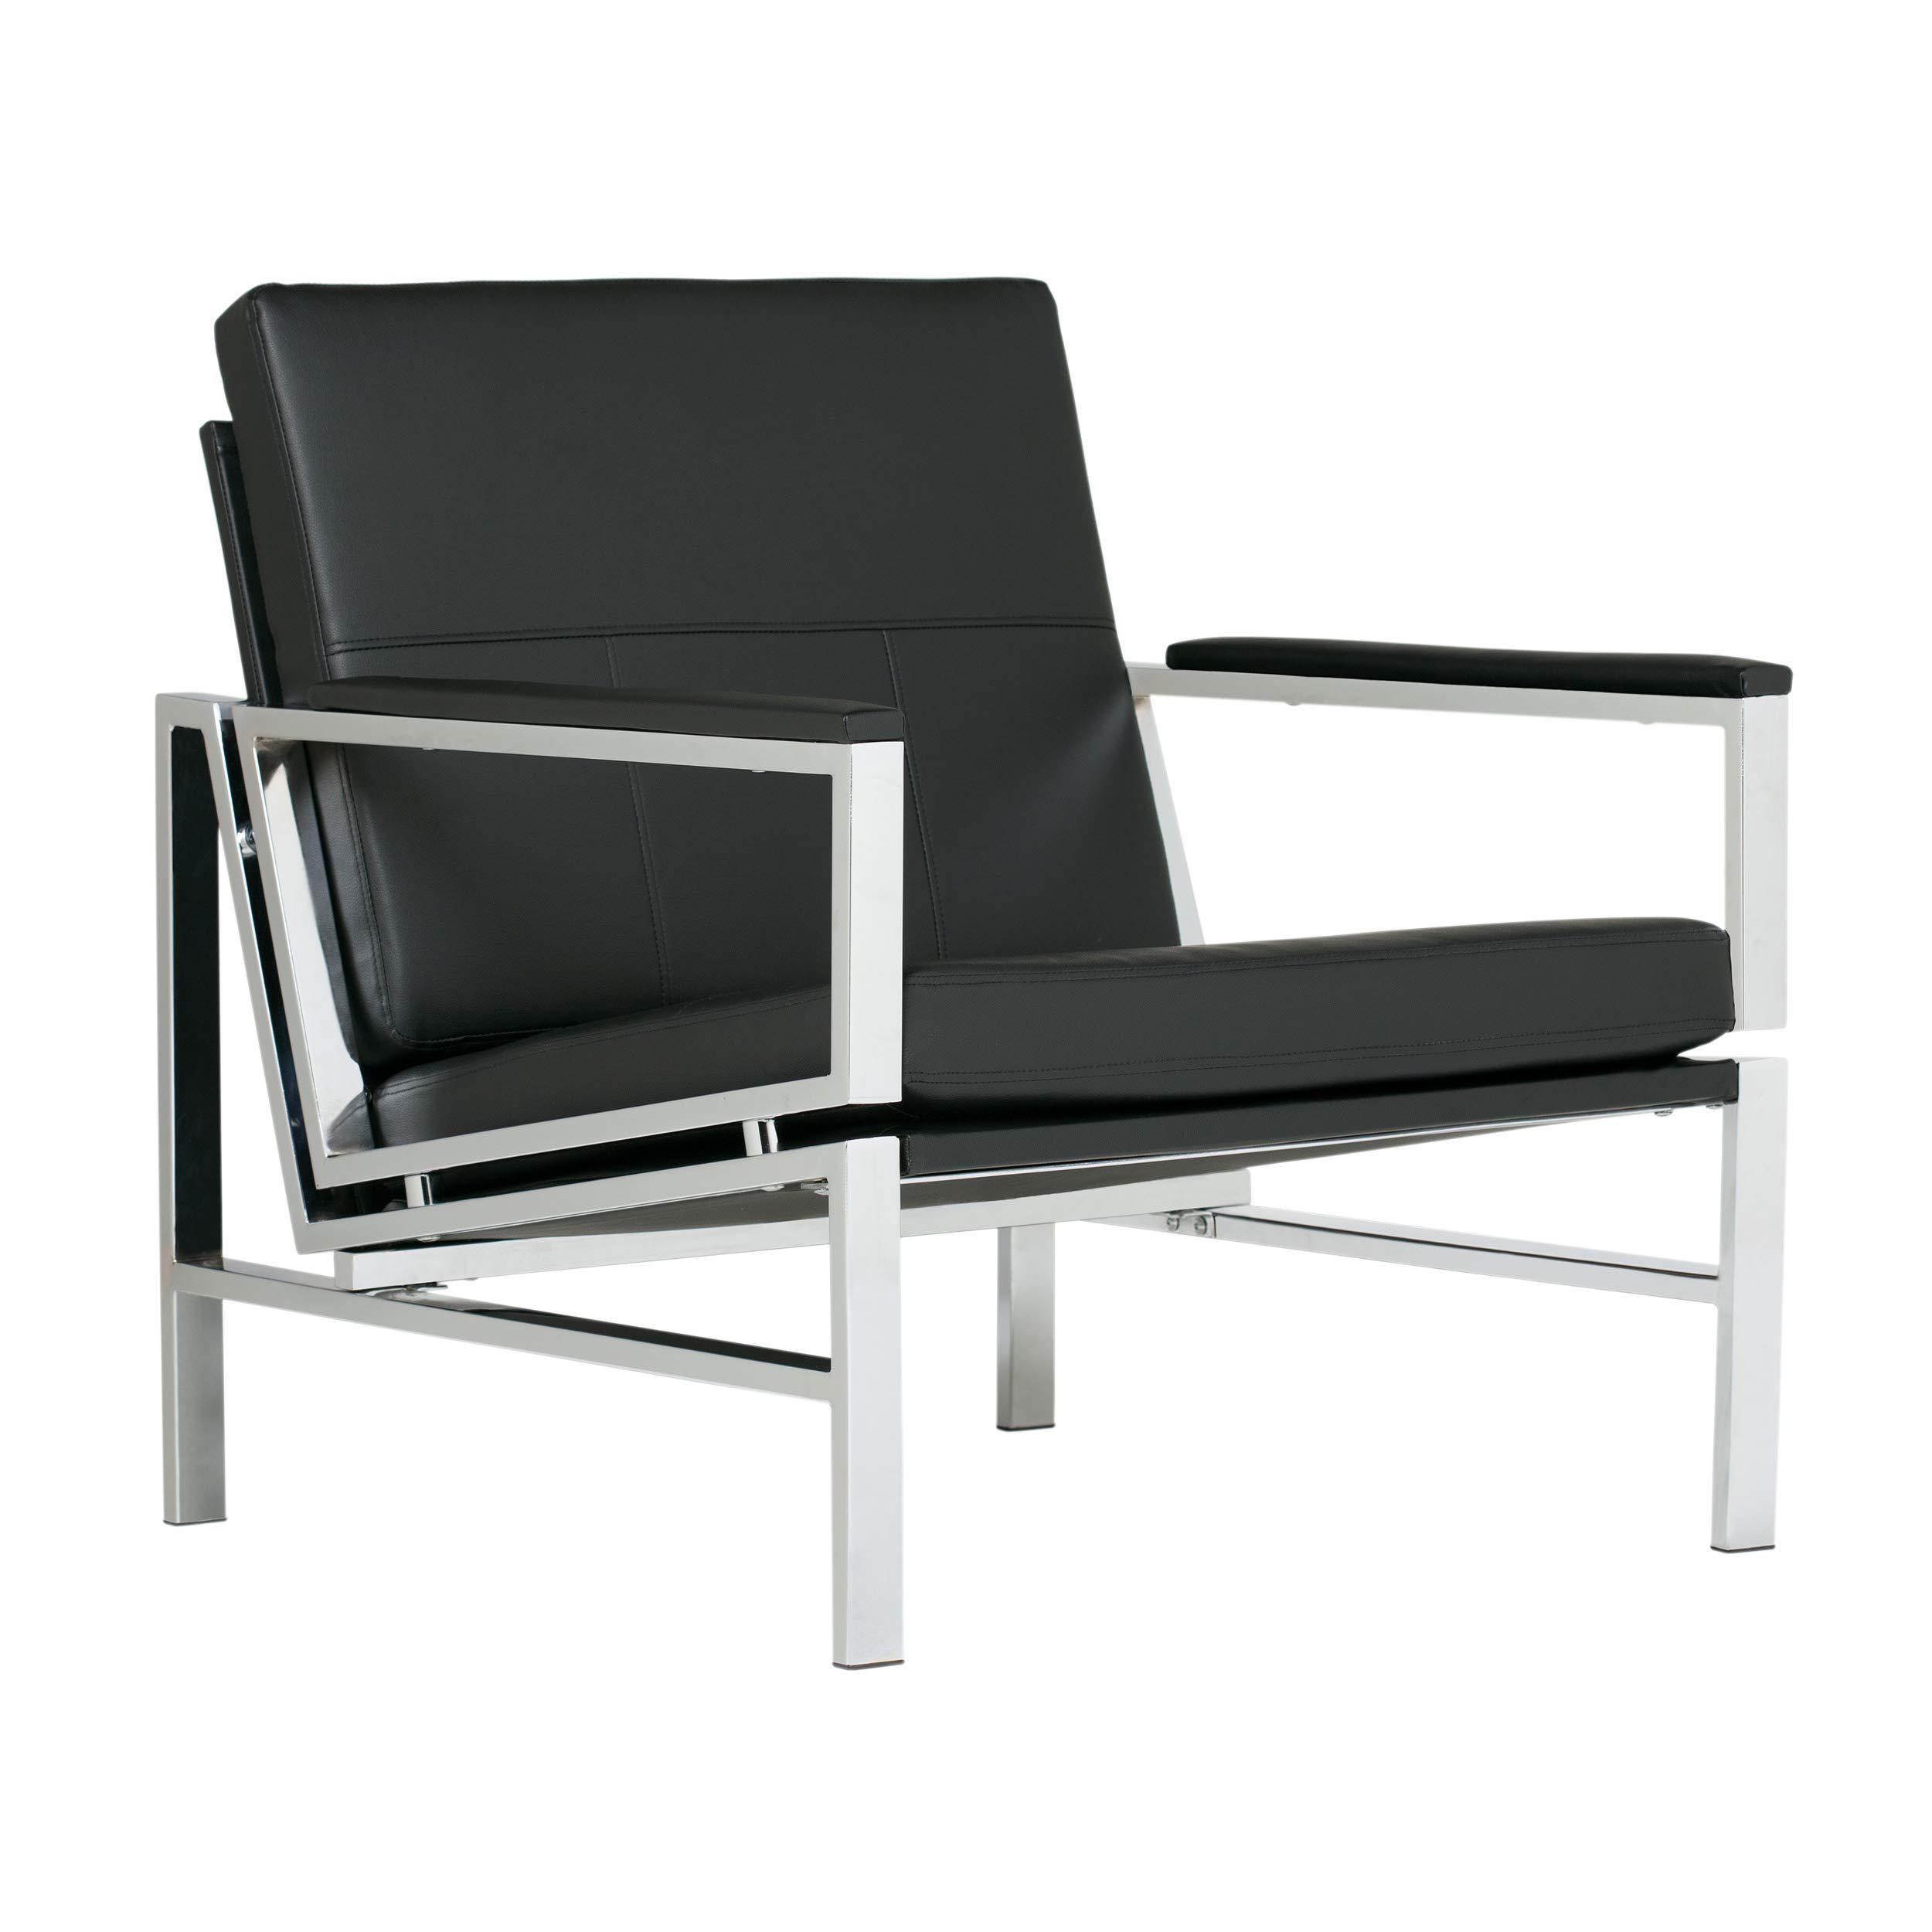 Bauhaus Dining Chairs Chair Pads Amp Cushions